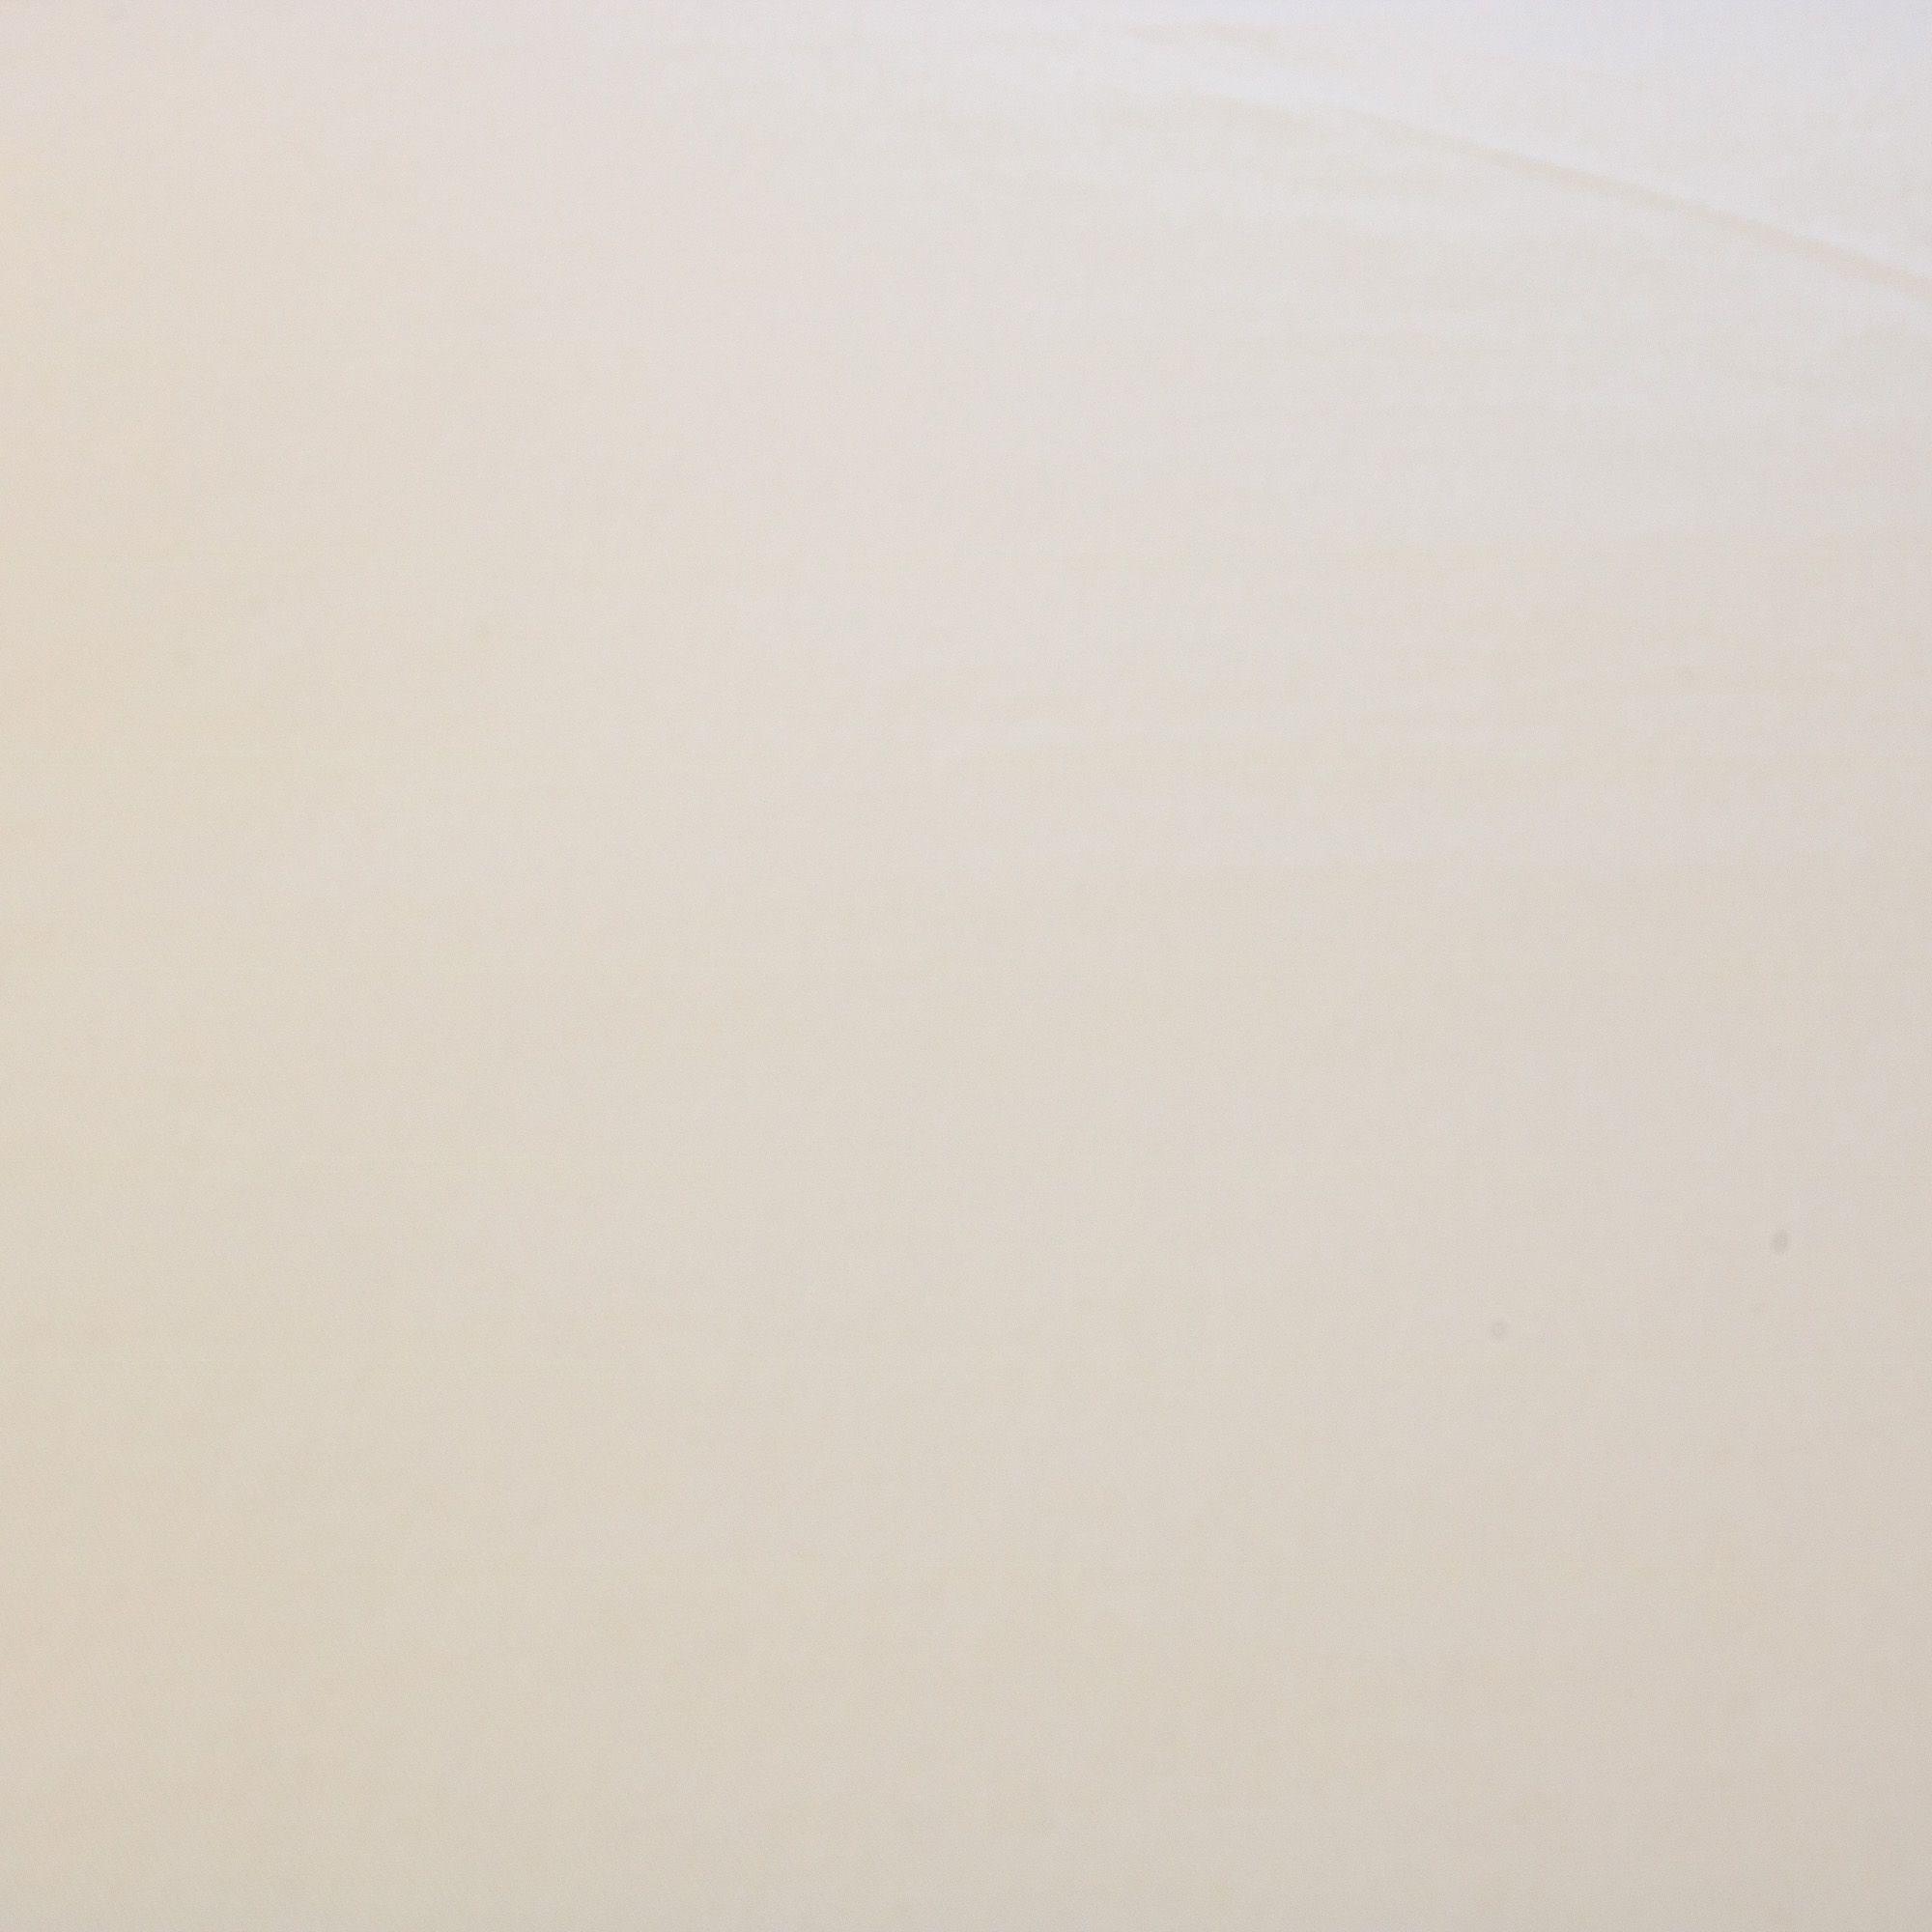 Tecido Brim 100% Algodao 1,60 Mt Largura Branco